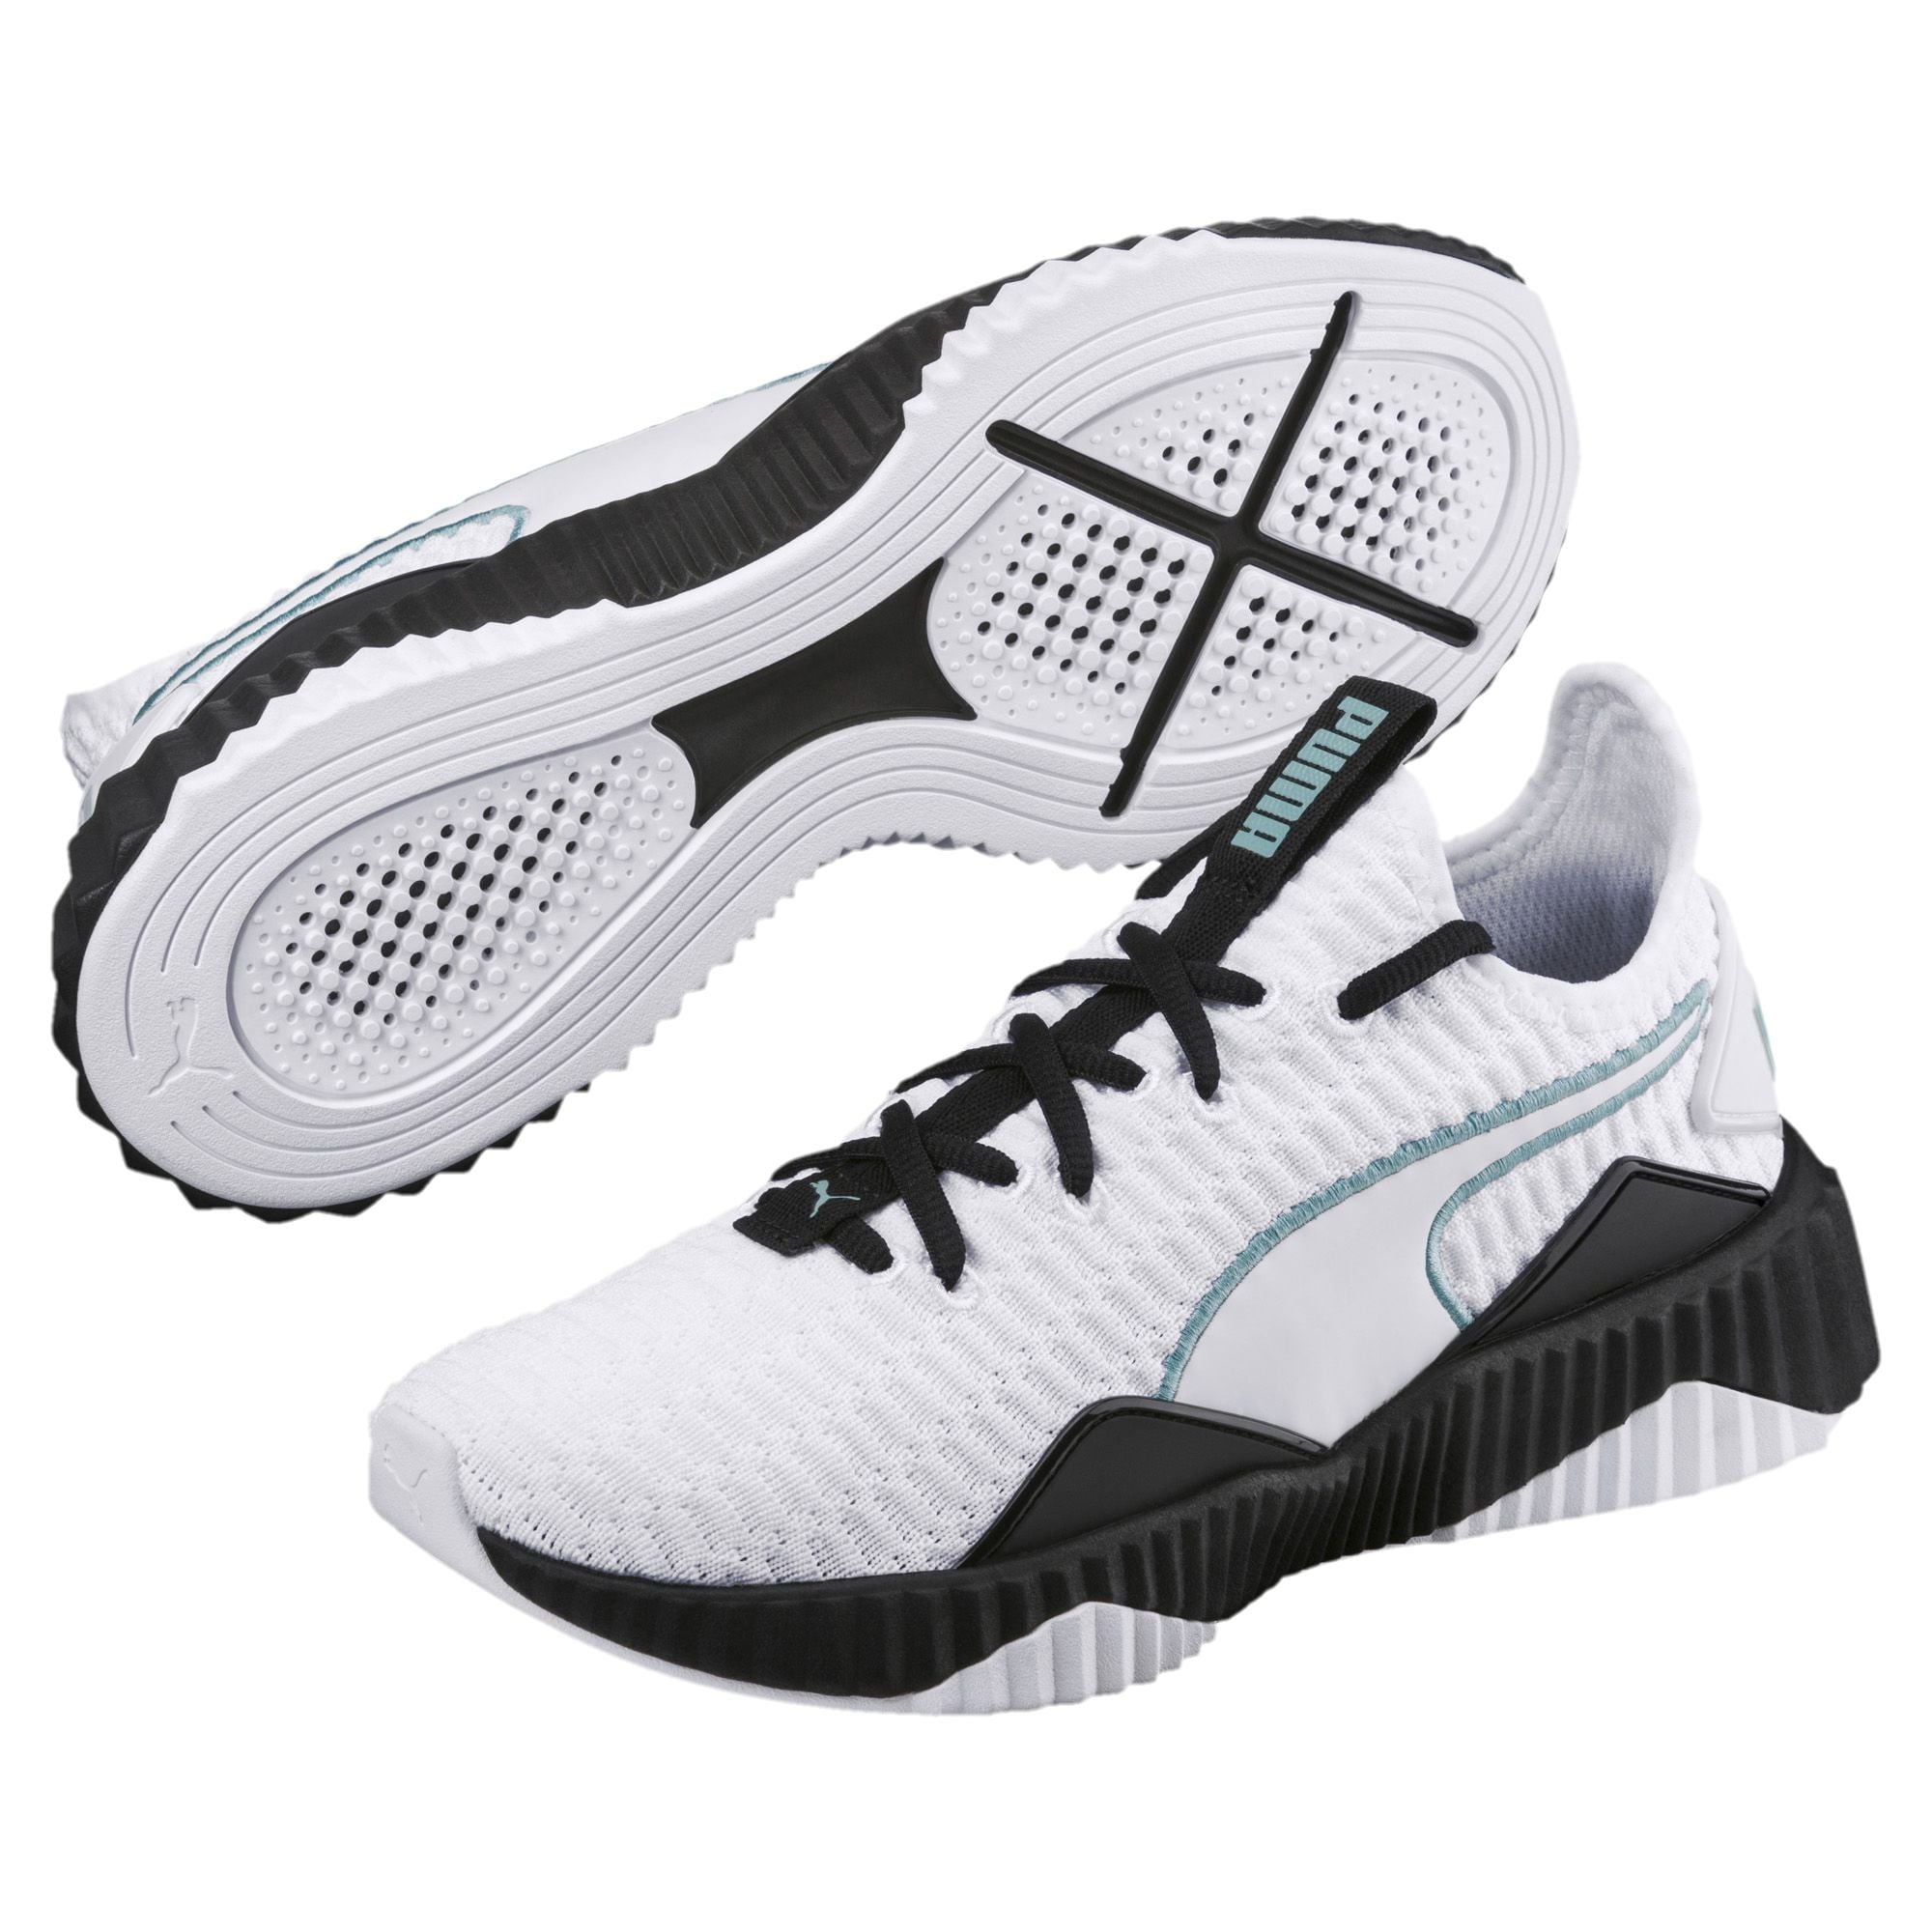 defy sneaker puma, OFF 79%,Buy!